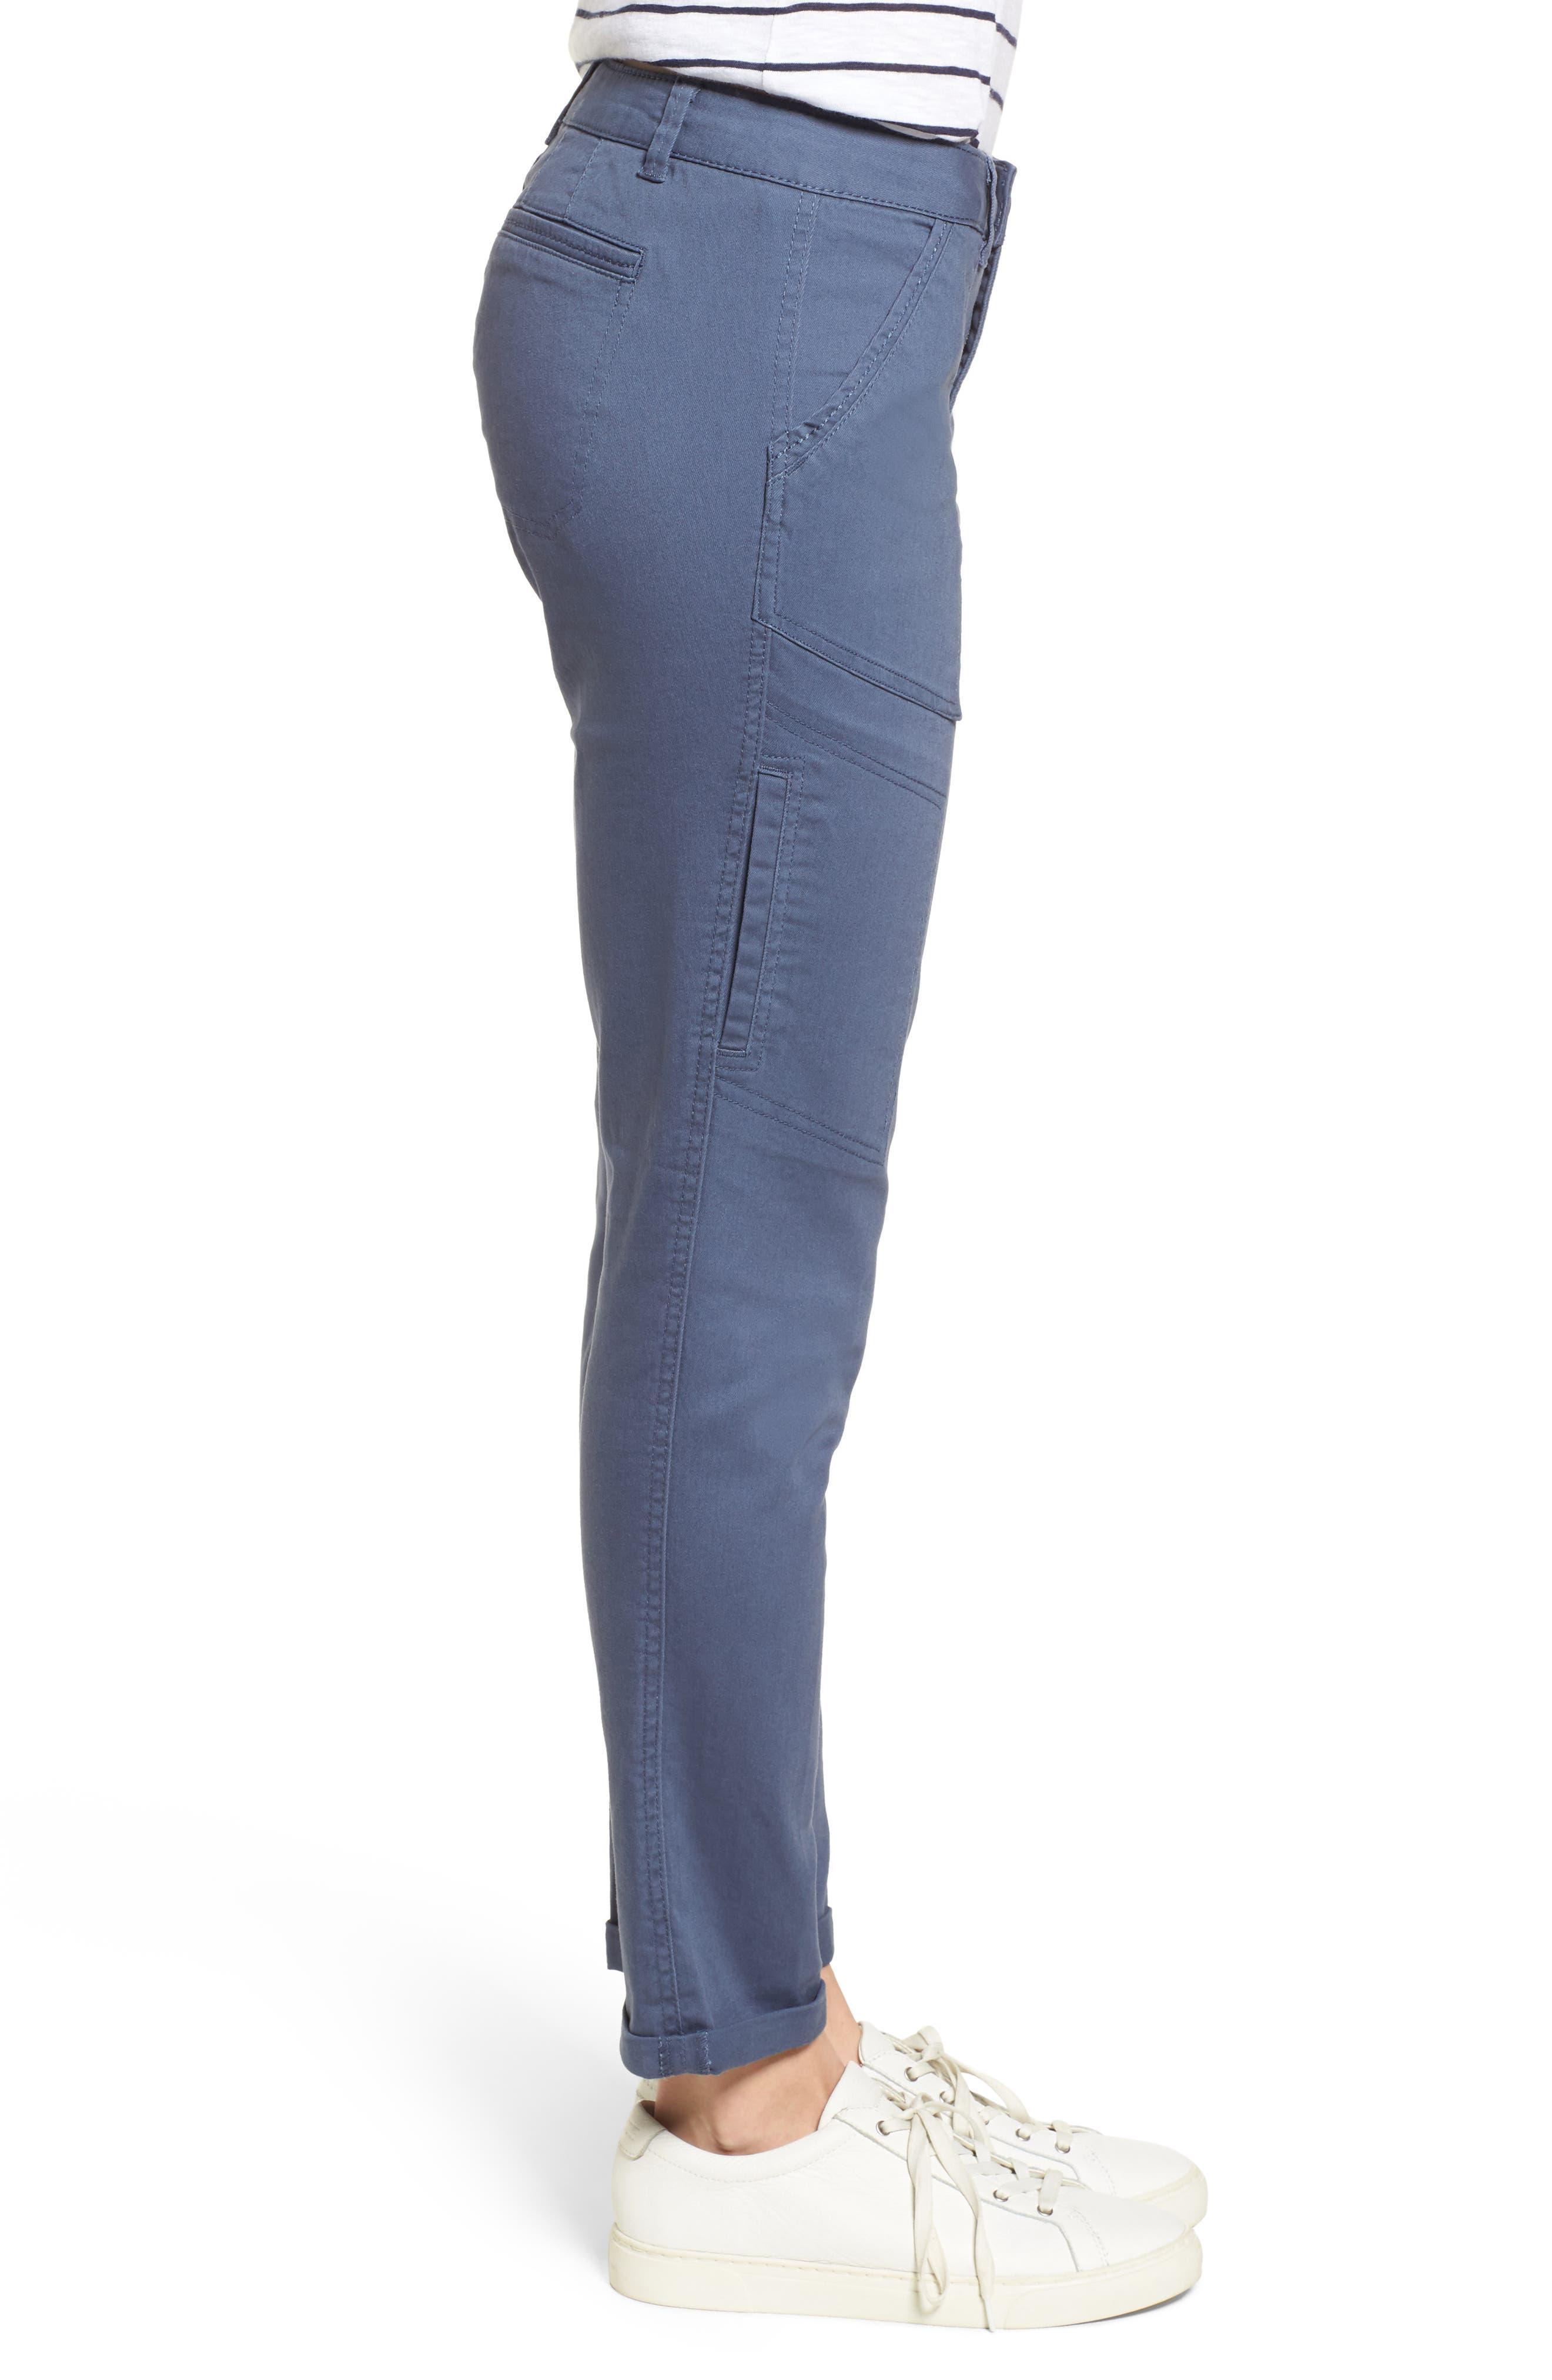 Twill Cargo Pants,                             Alternate thumbnail 3, color,                             Slate Blue